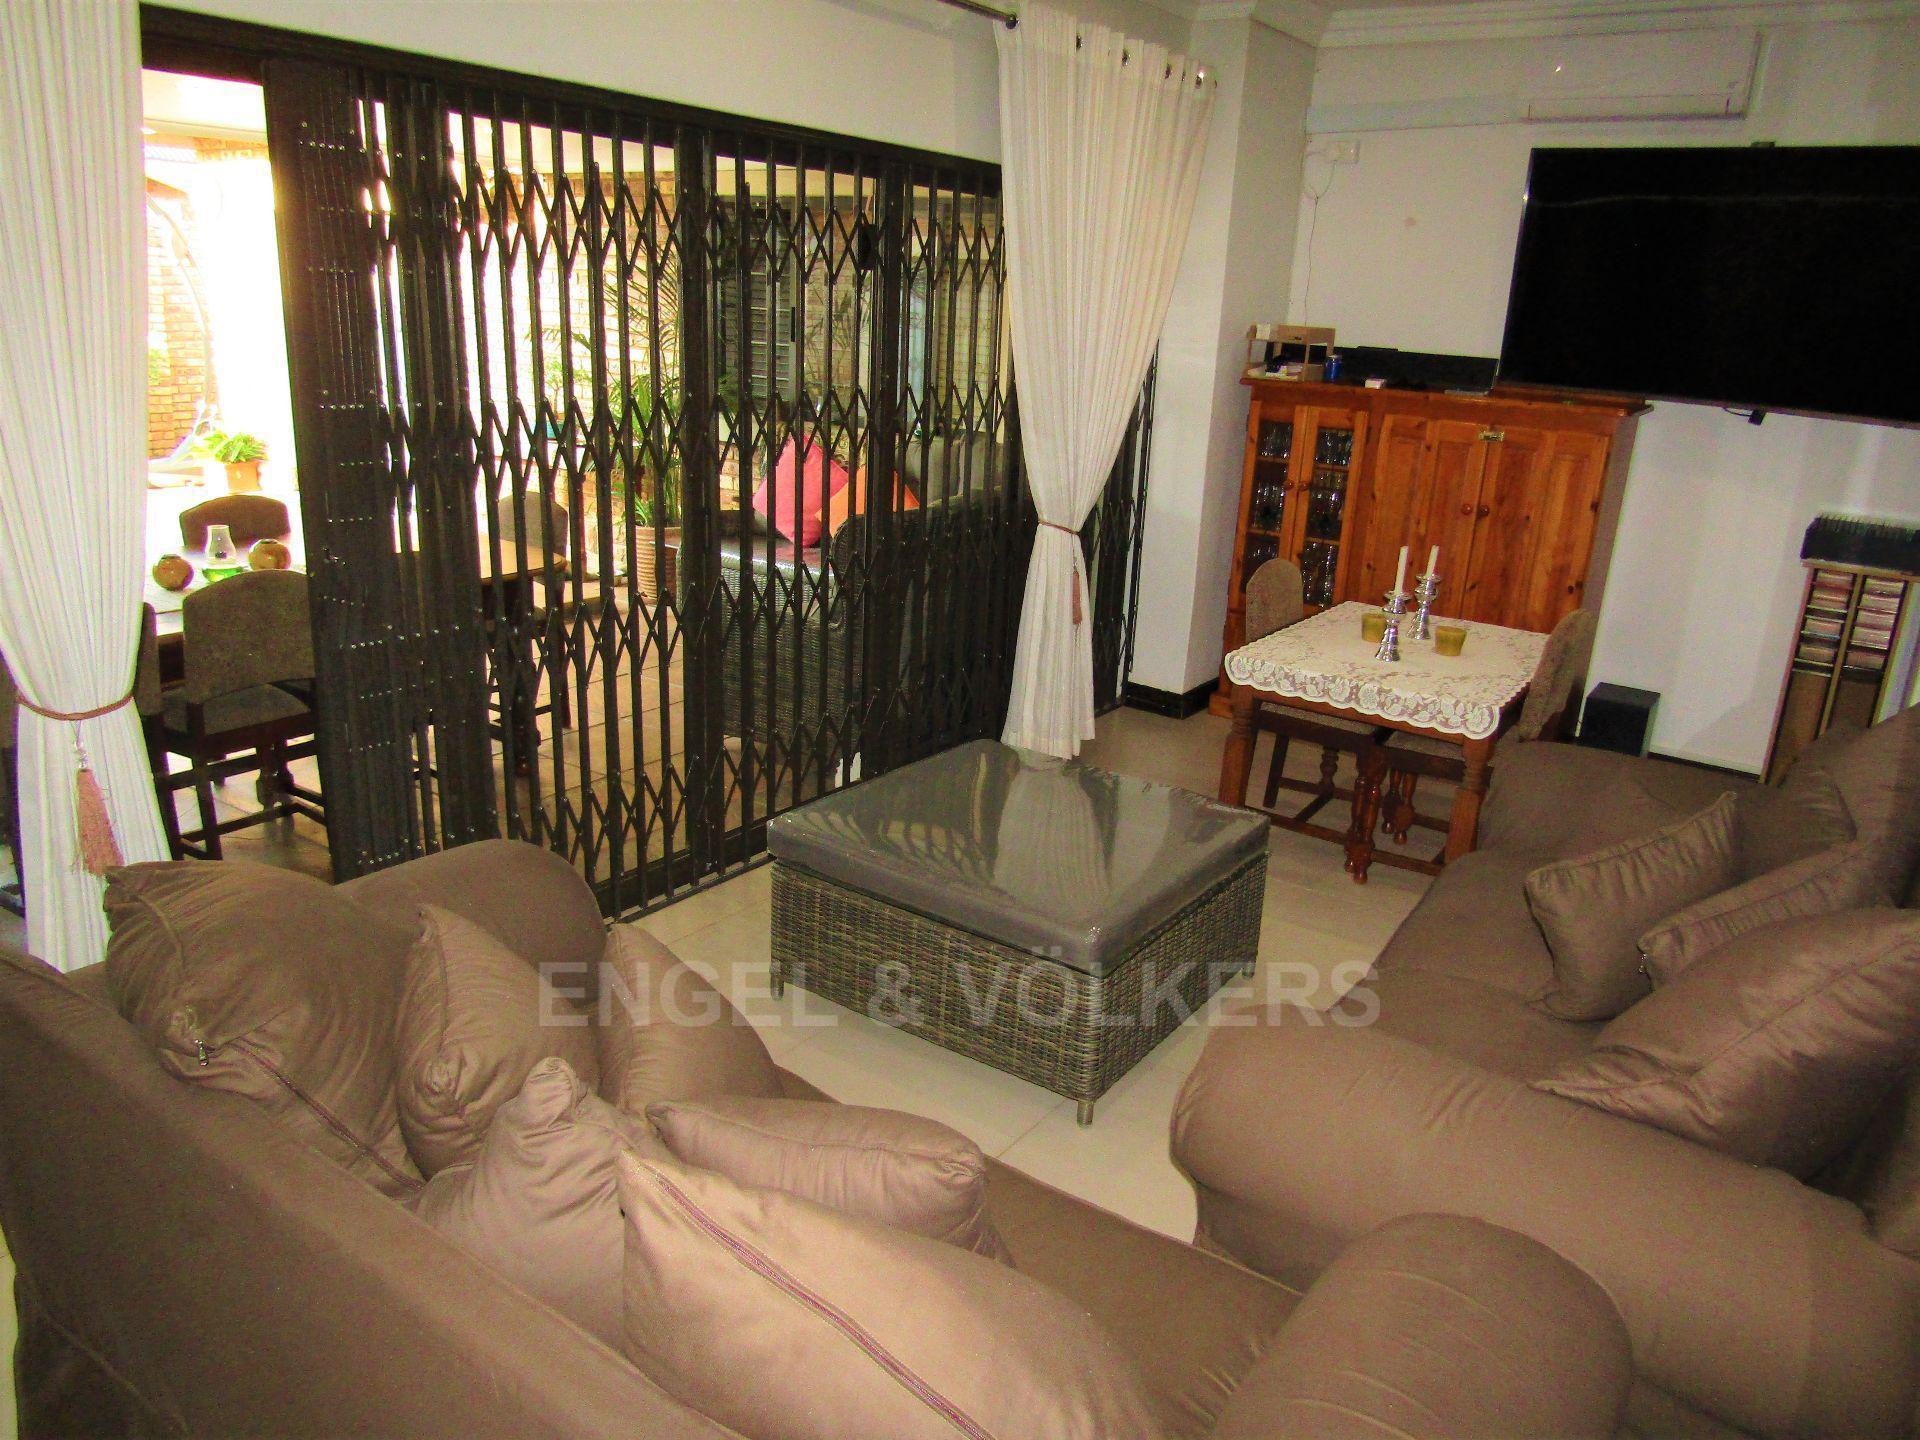 Lifestyle Estate property for sale. Ref No: 13458759. Picture no 9